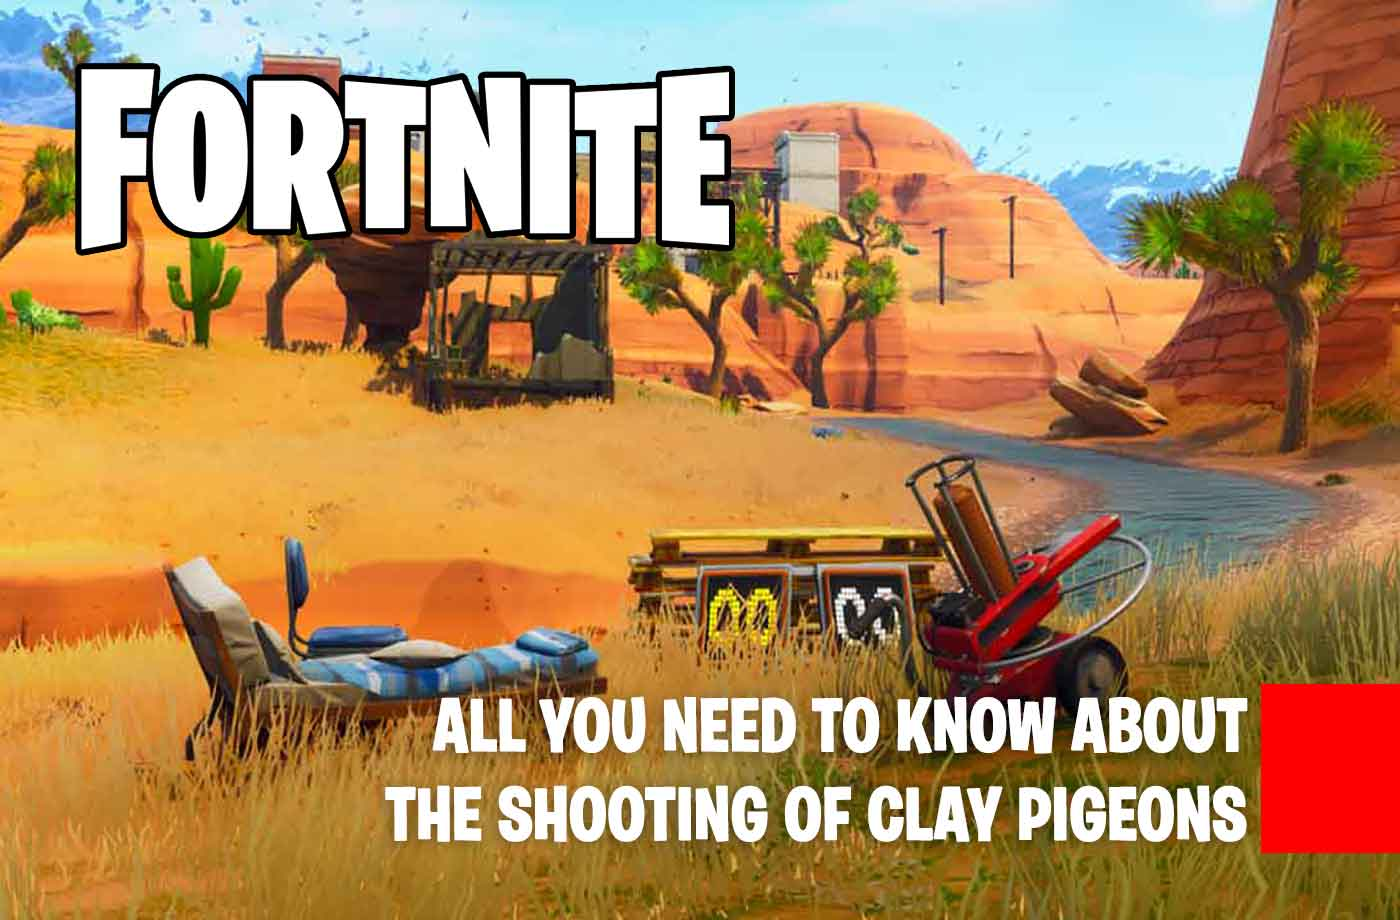 challenge fortnite how to shoot clay pigeons week 3 season 5 - clay duck fortnite